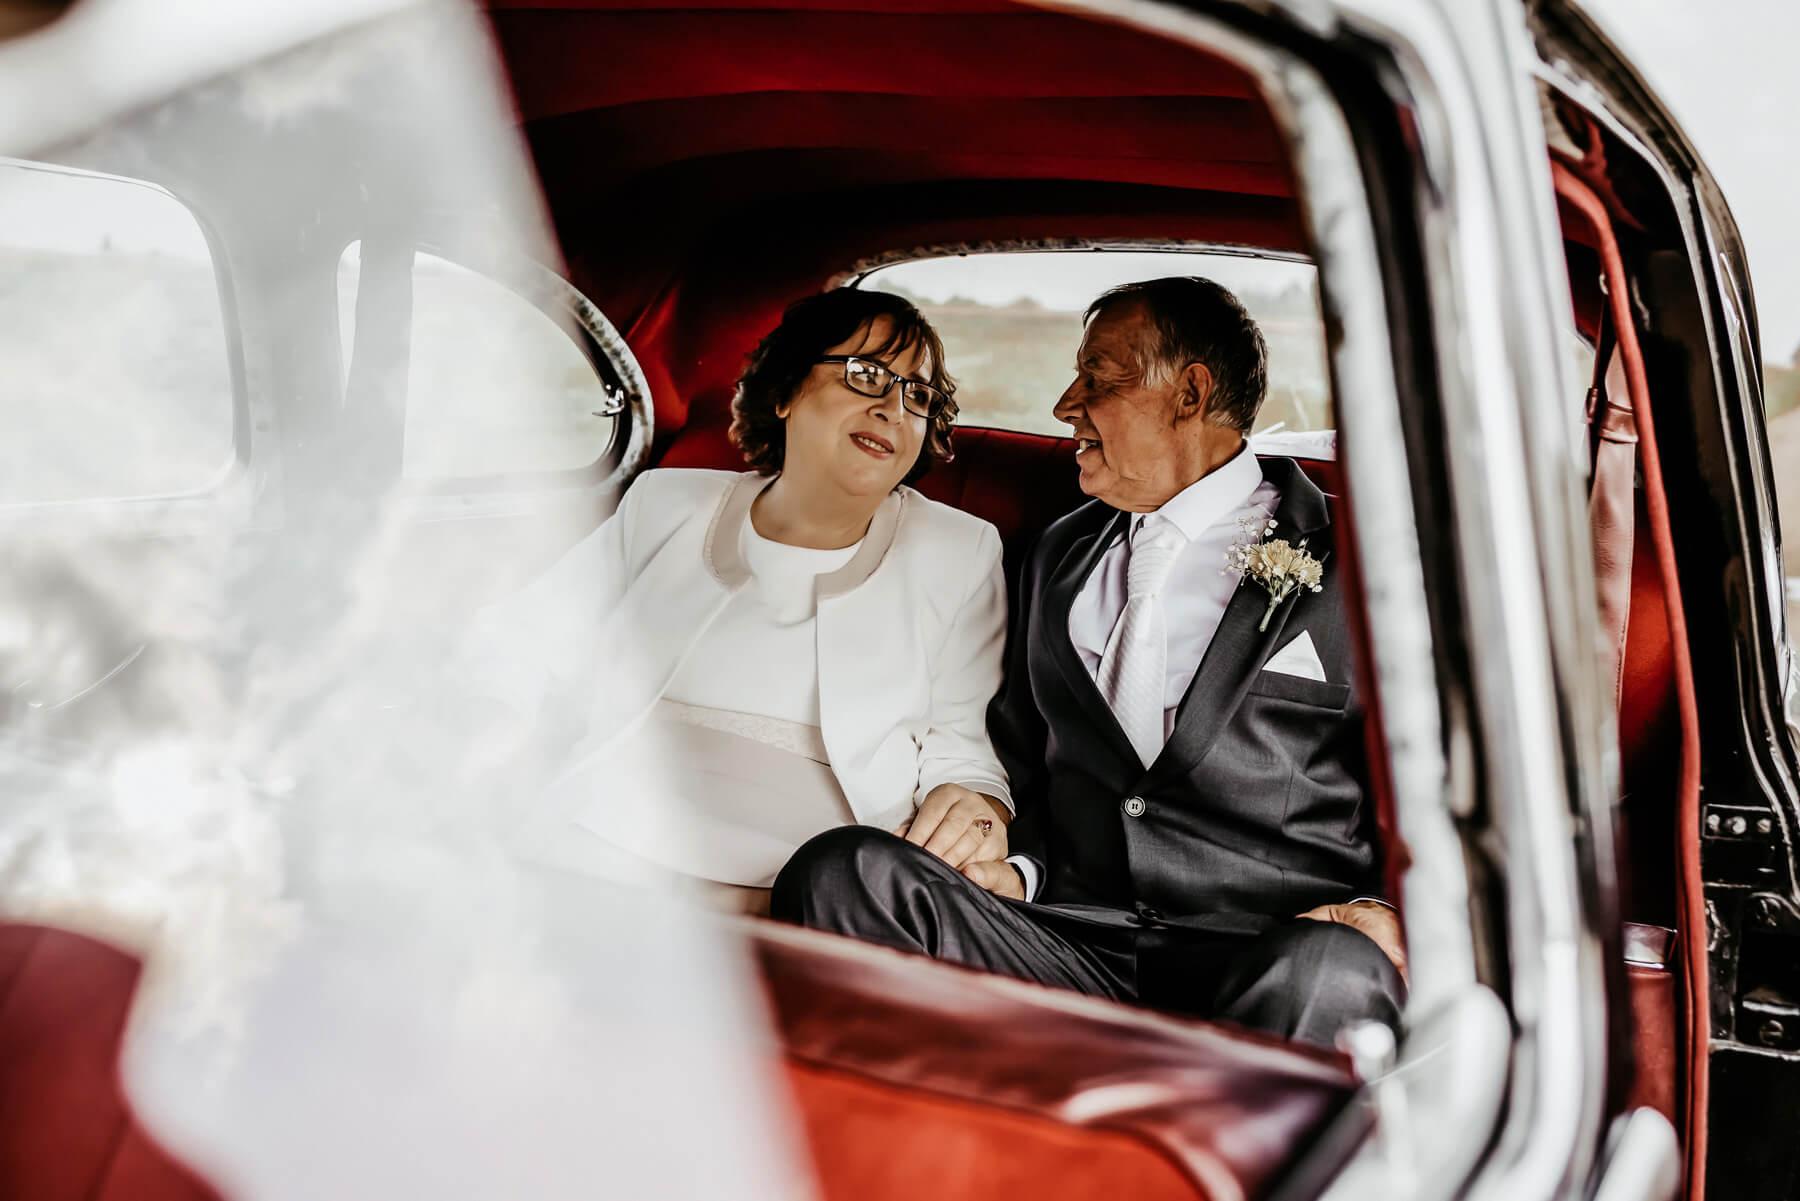 vestuves senjorai 50 metu kartu